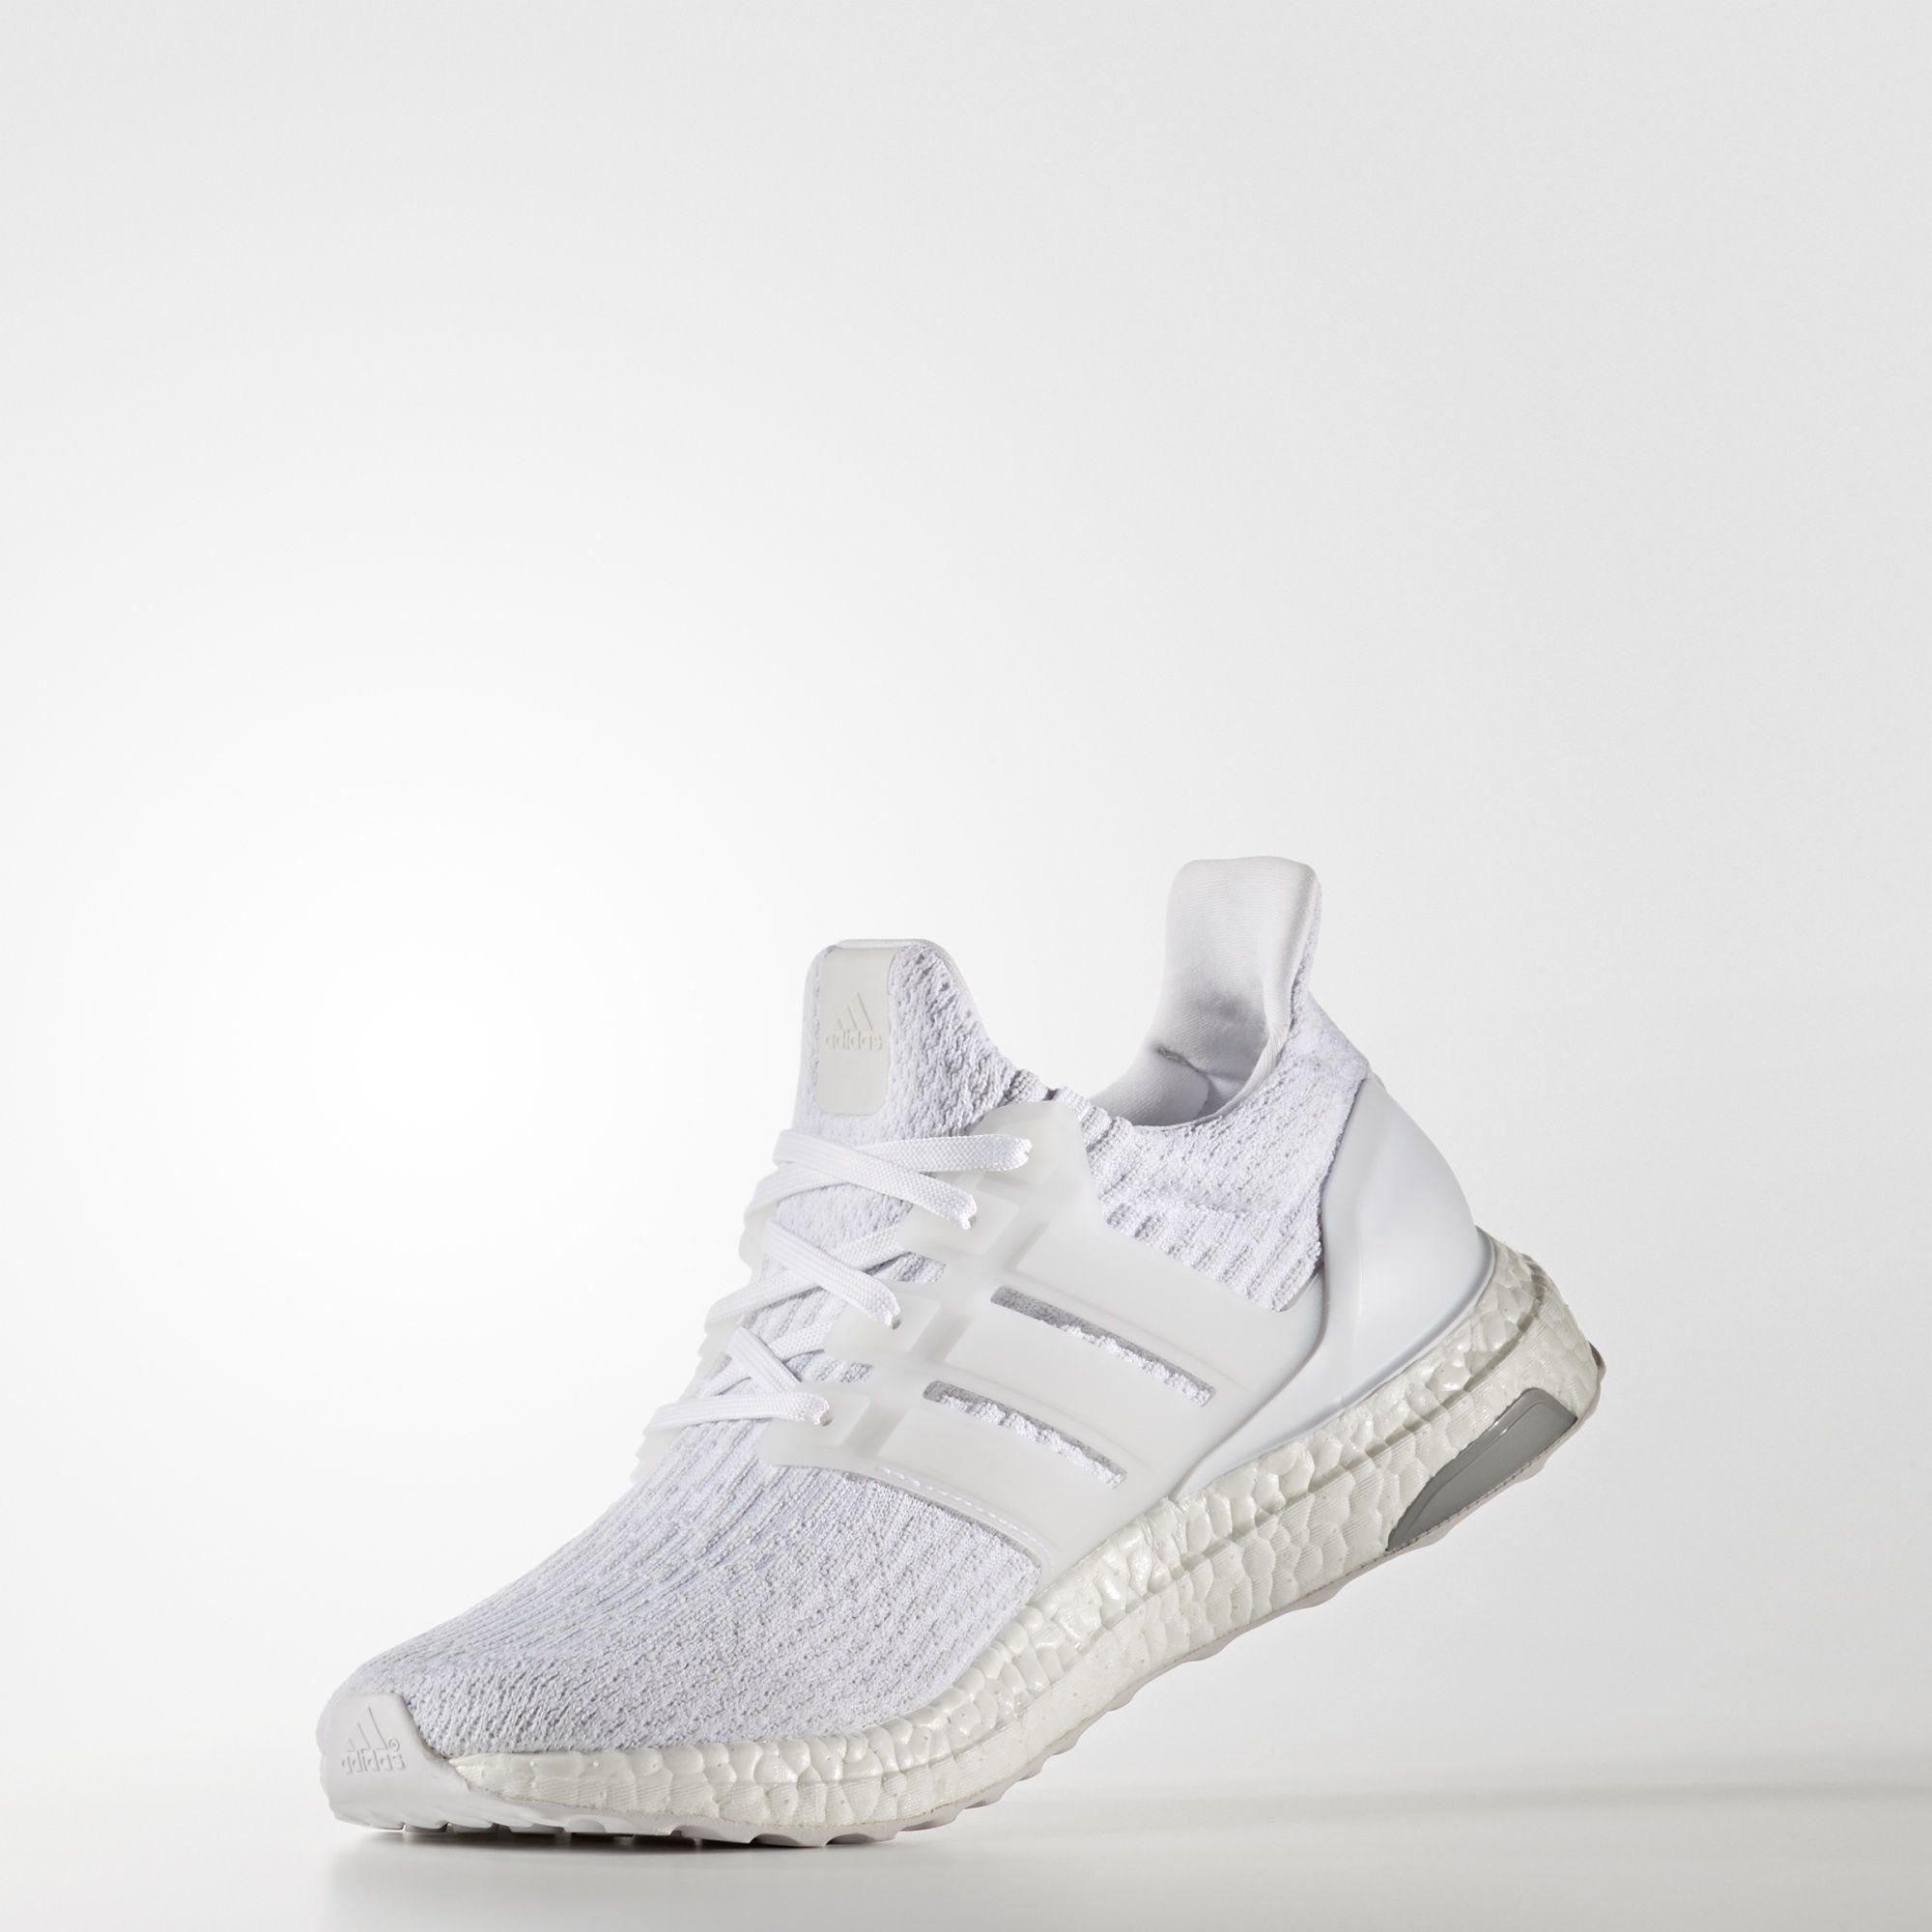 adidas Ultra Boost 3 0 Triple White BA8841 4